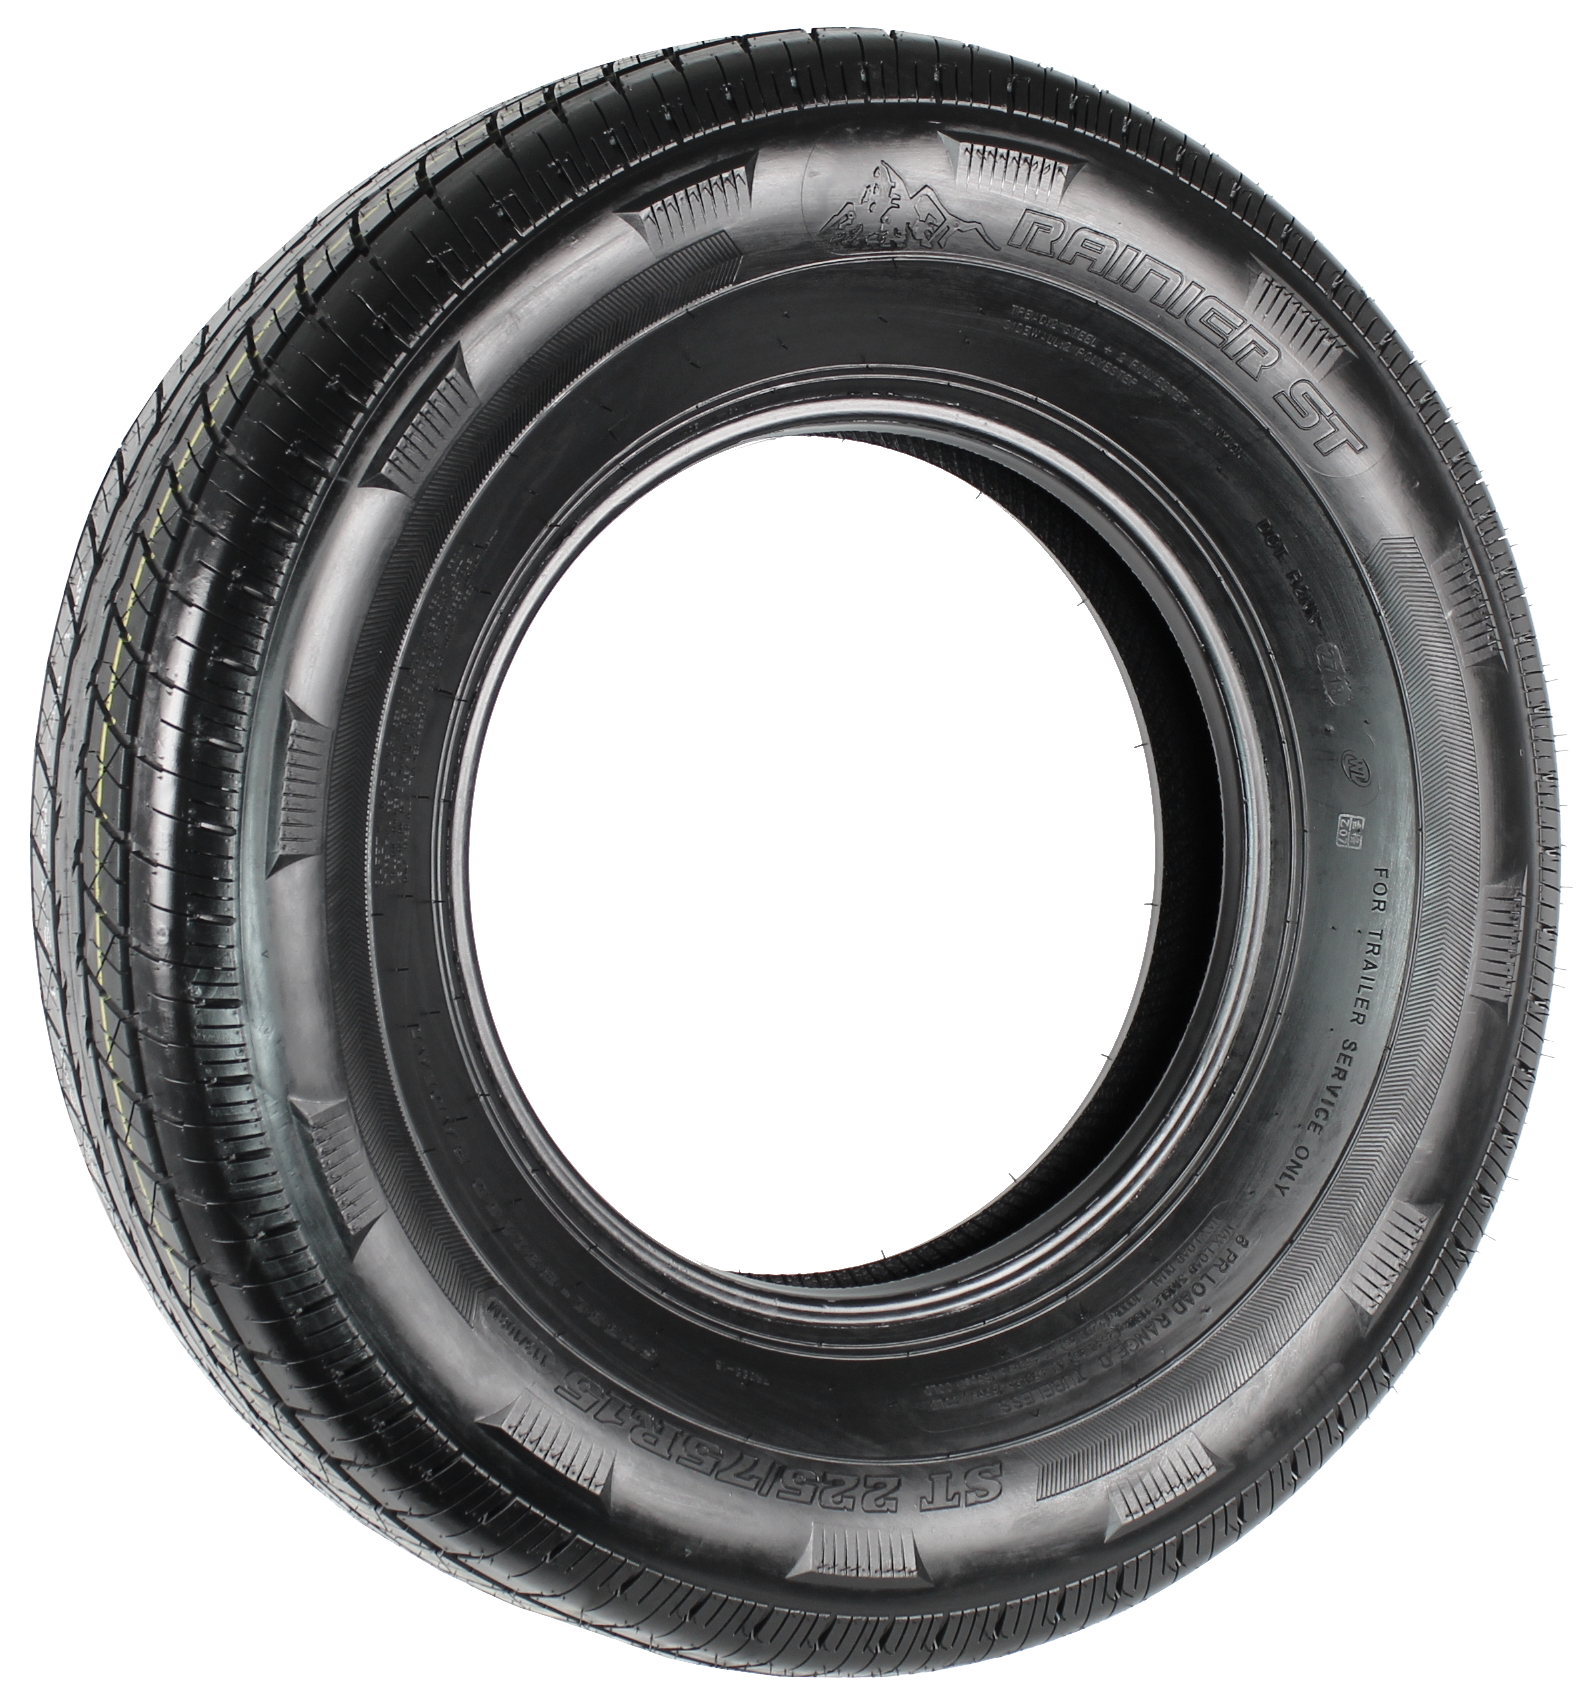 Rainier ST225/75R15 LRD 8-Ply Radial Trailer Tire Image